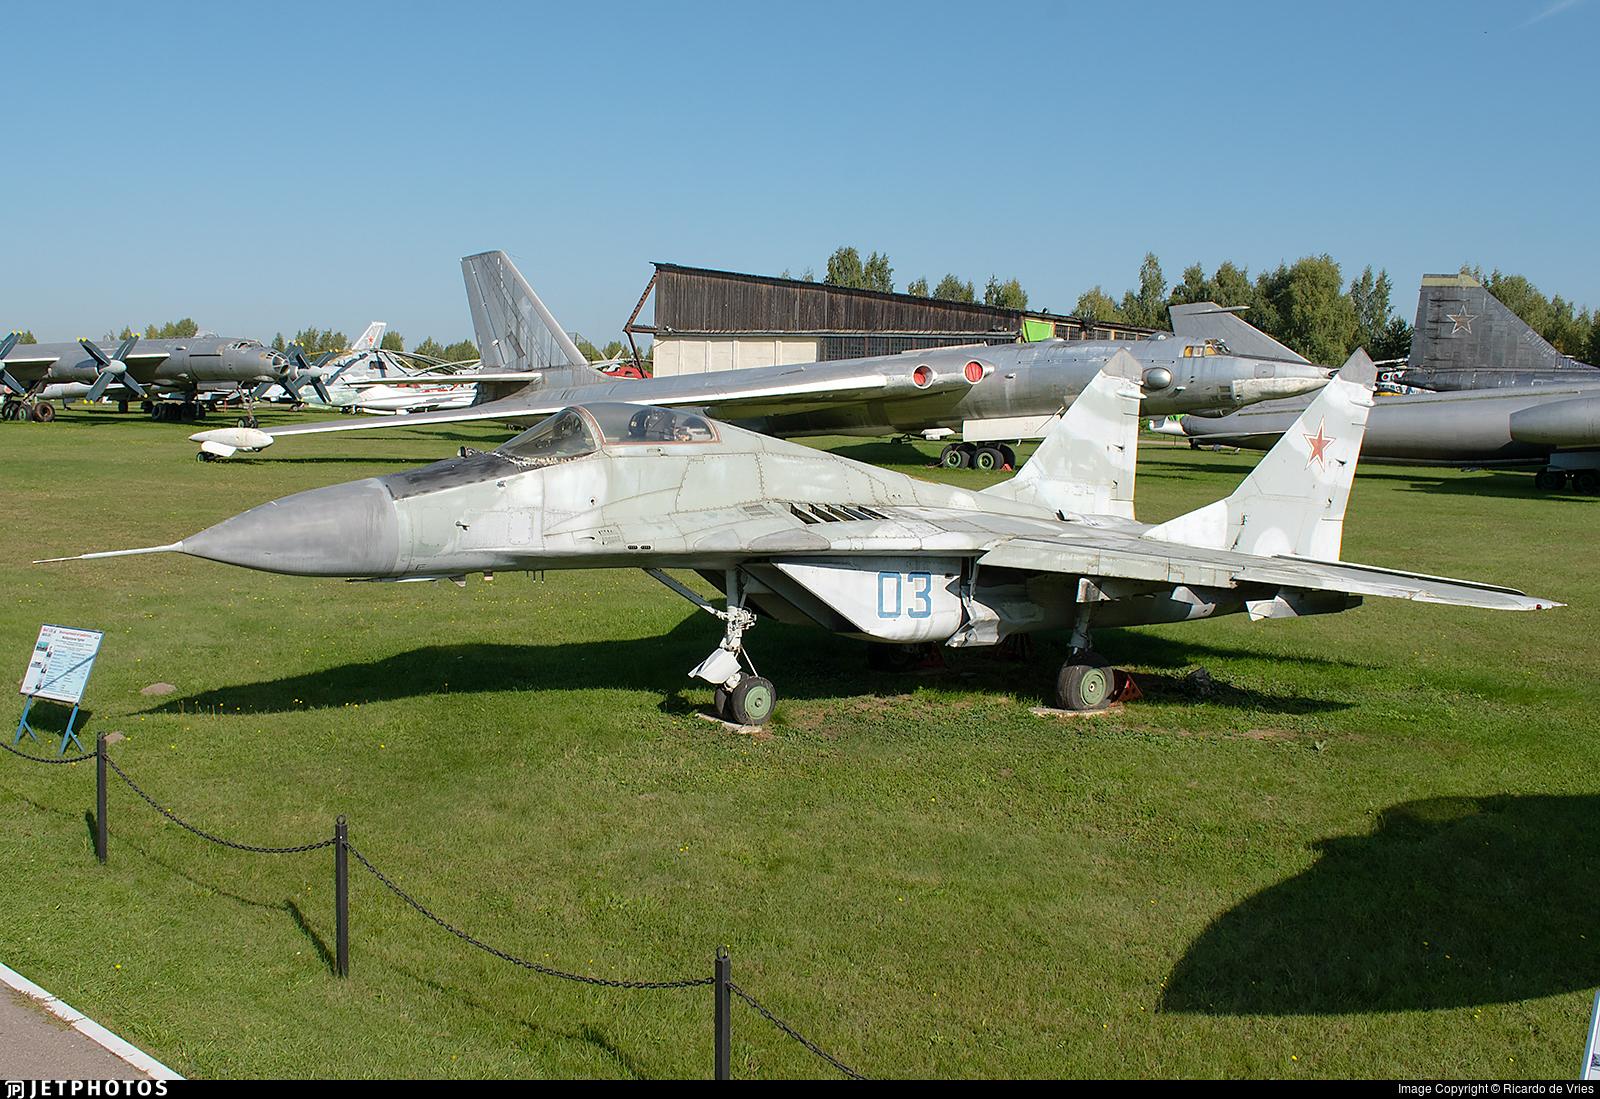 03 - Mikoyan-Gurevich MiG-29 Fulcrum - Russia - Air Force